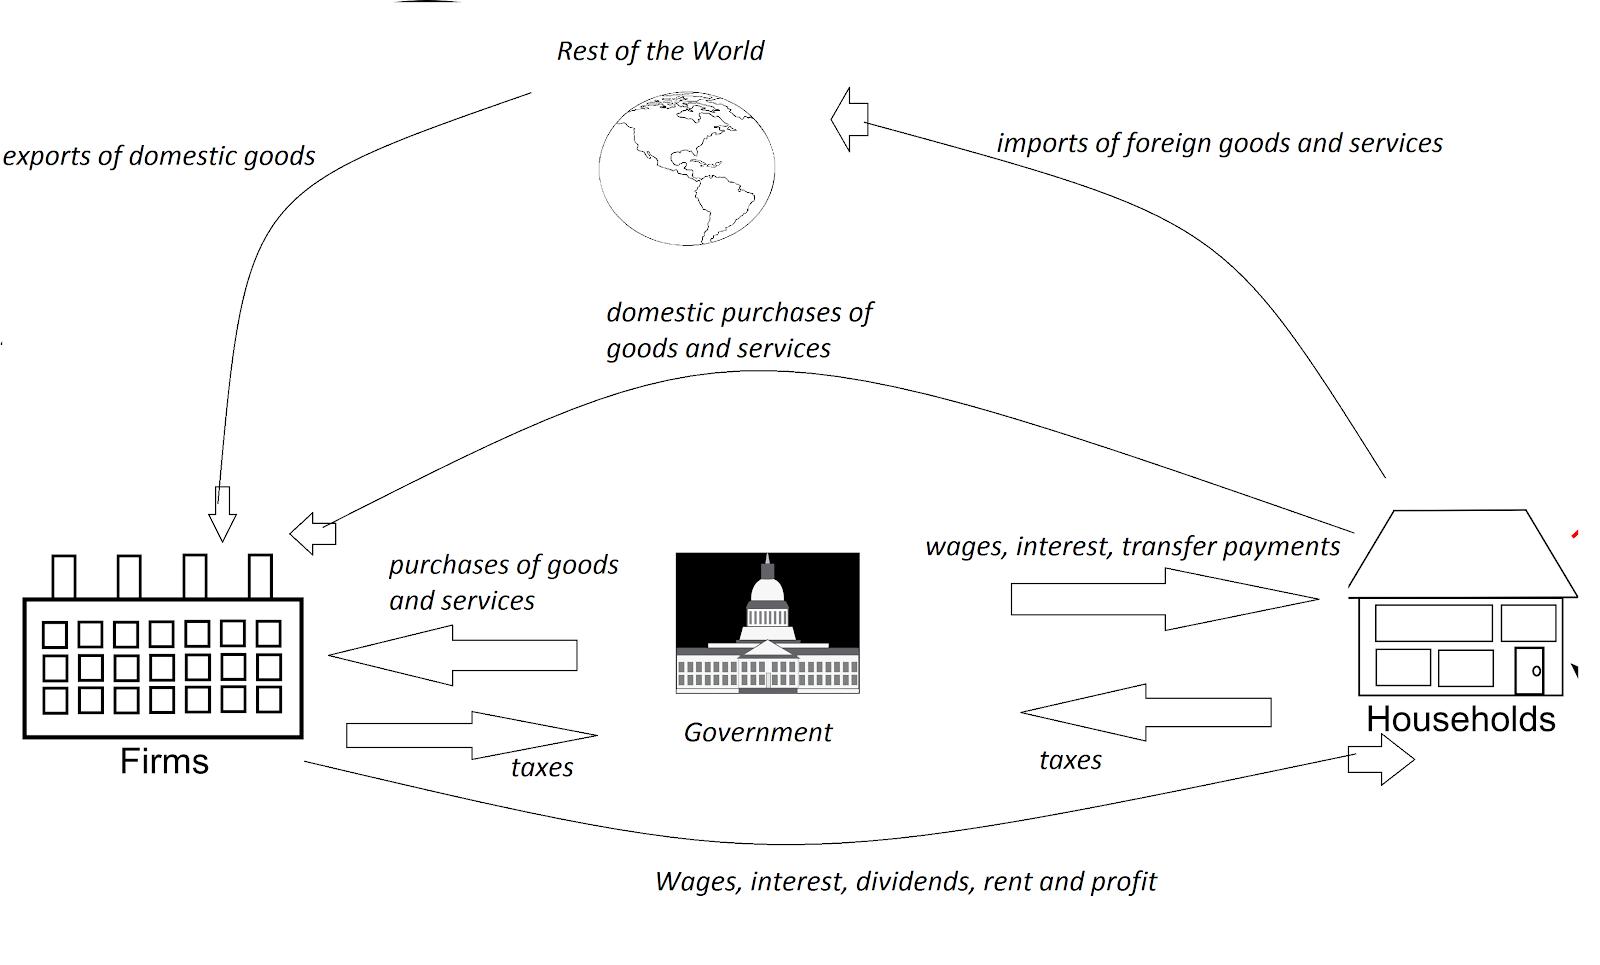 Wiring Diagram 33 In The Circular Flow Diagram Households